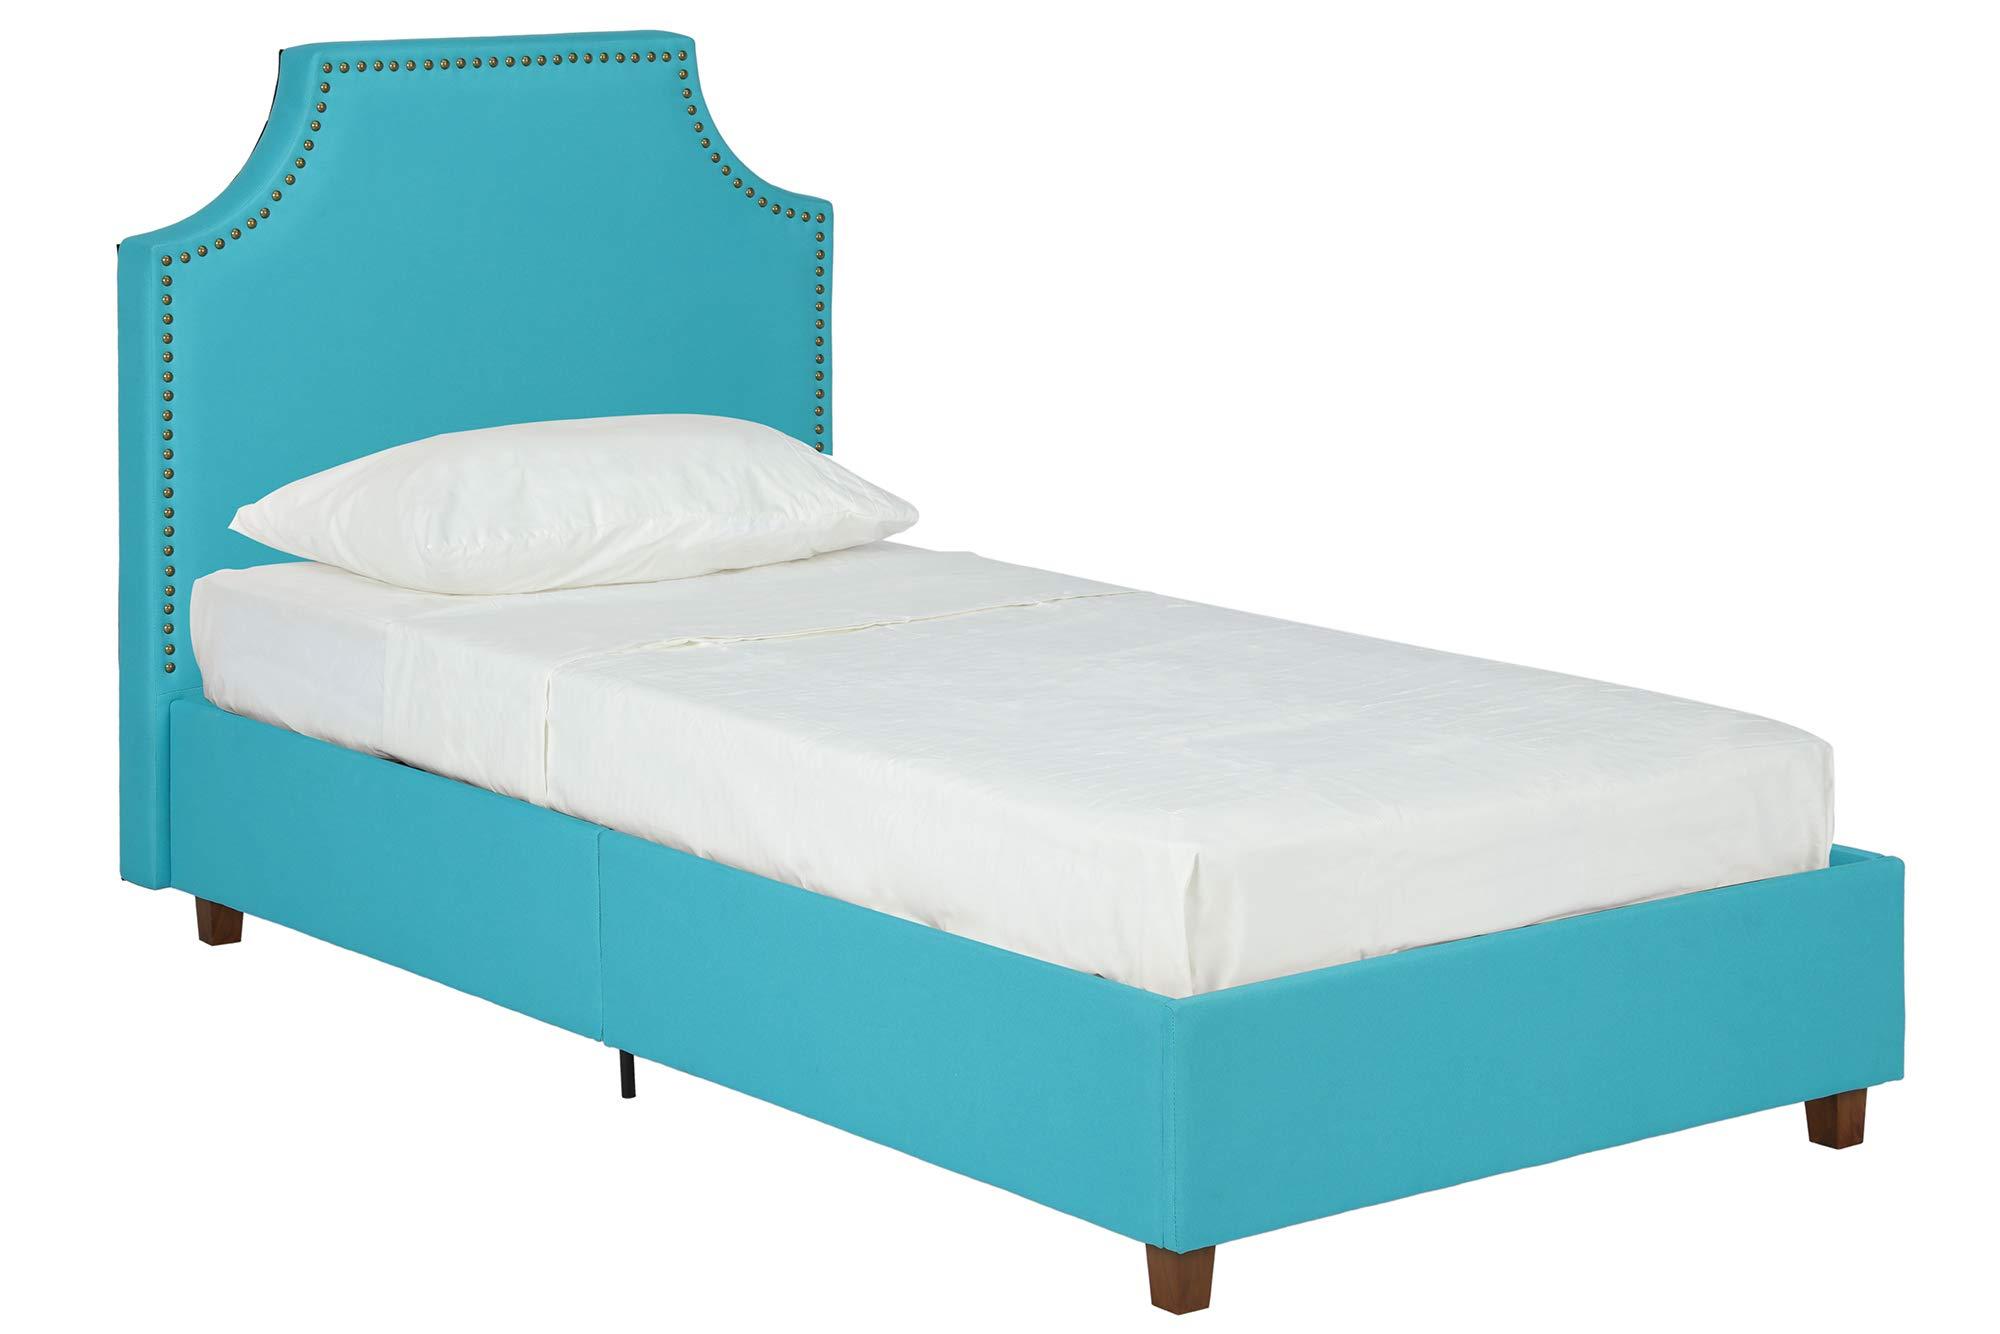 DHP Melita Linen Upholstered Platform Bed Frame, Teal, Twin by DHP